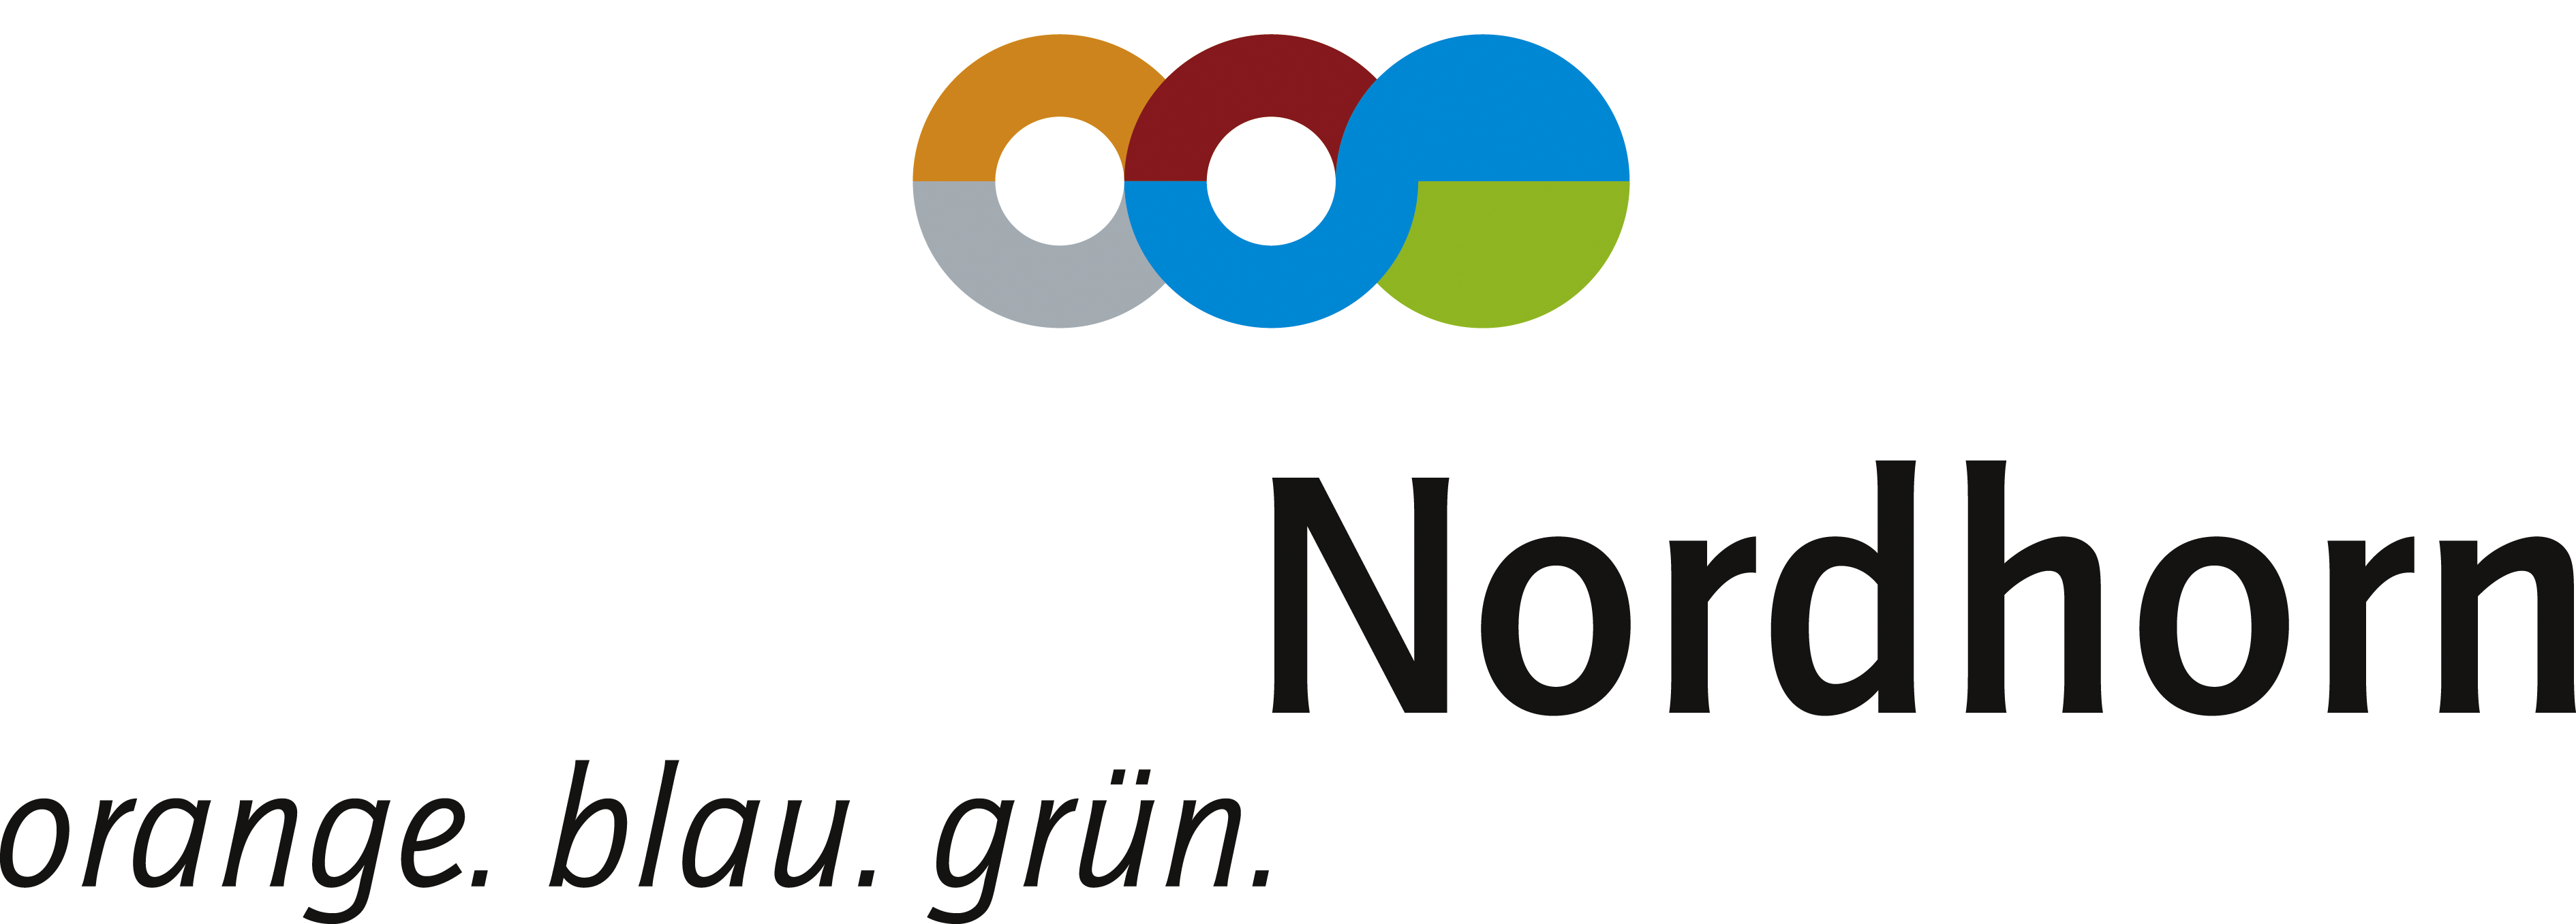 Nordhorn (orange.blau.grün.) RGB